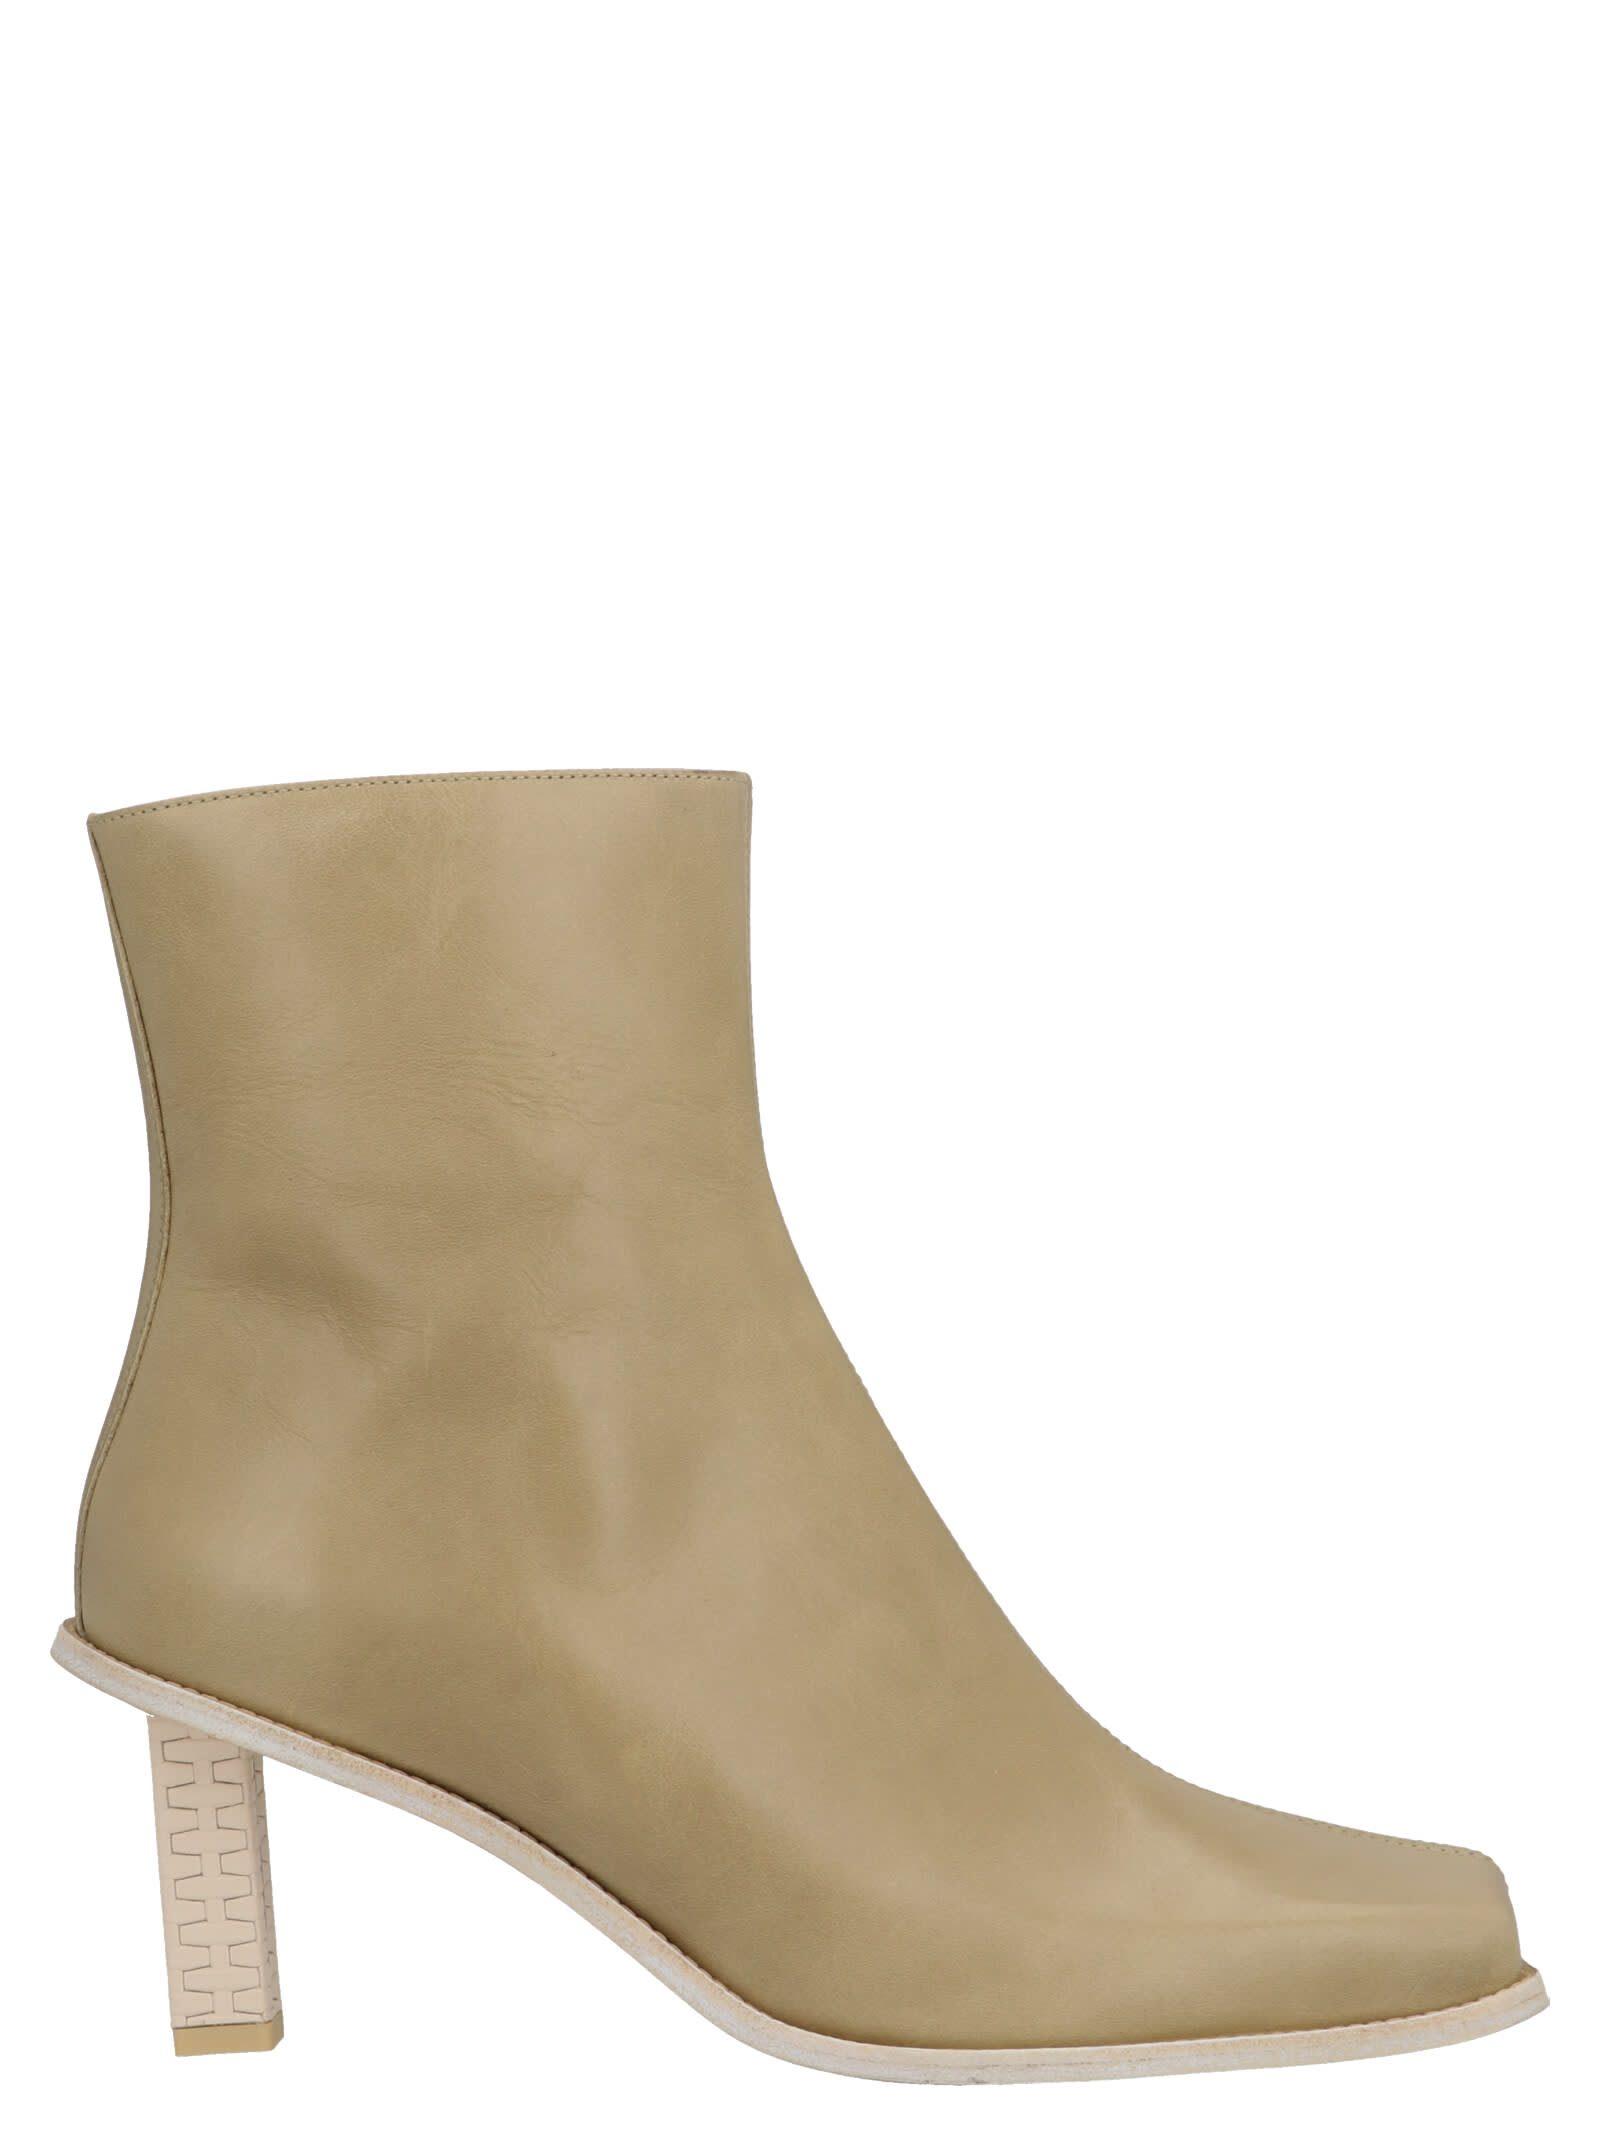 Jacquemus carro Basses Shoes